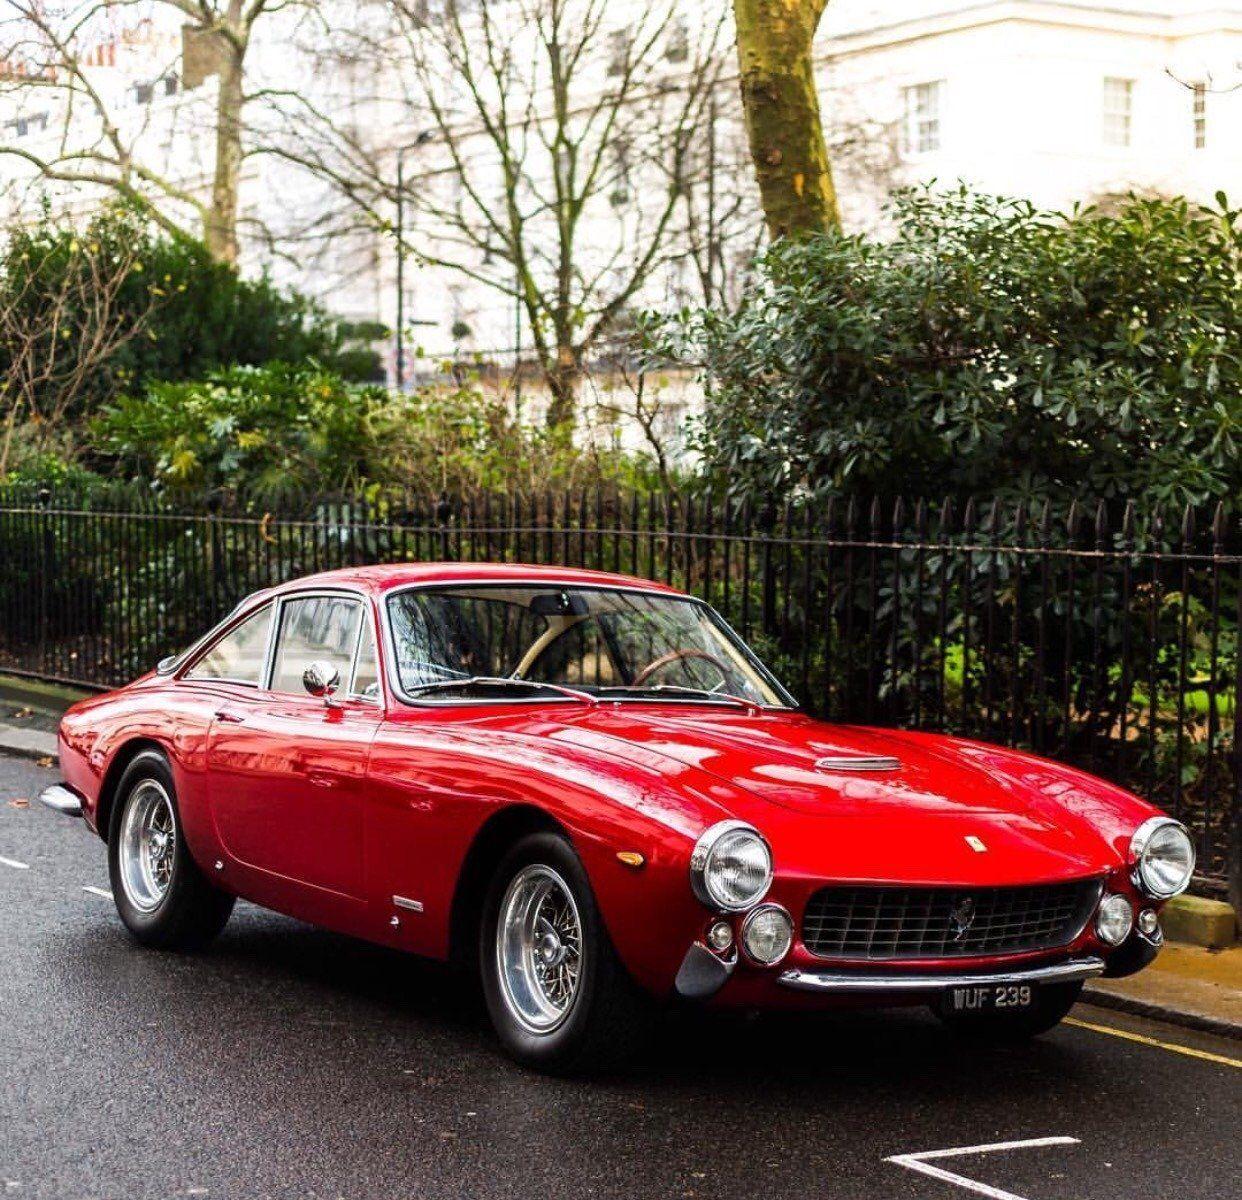 Lienhard Racing Photography On Twitter In 2020 Classic Cars Classic European Cars Ferrari